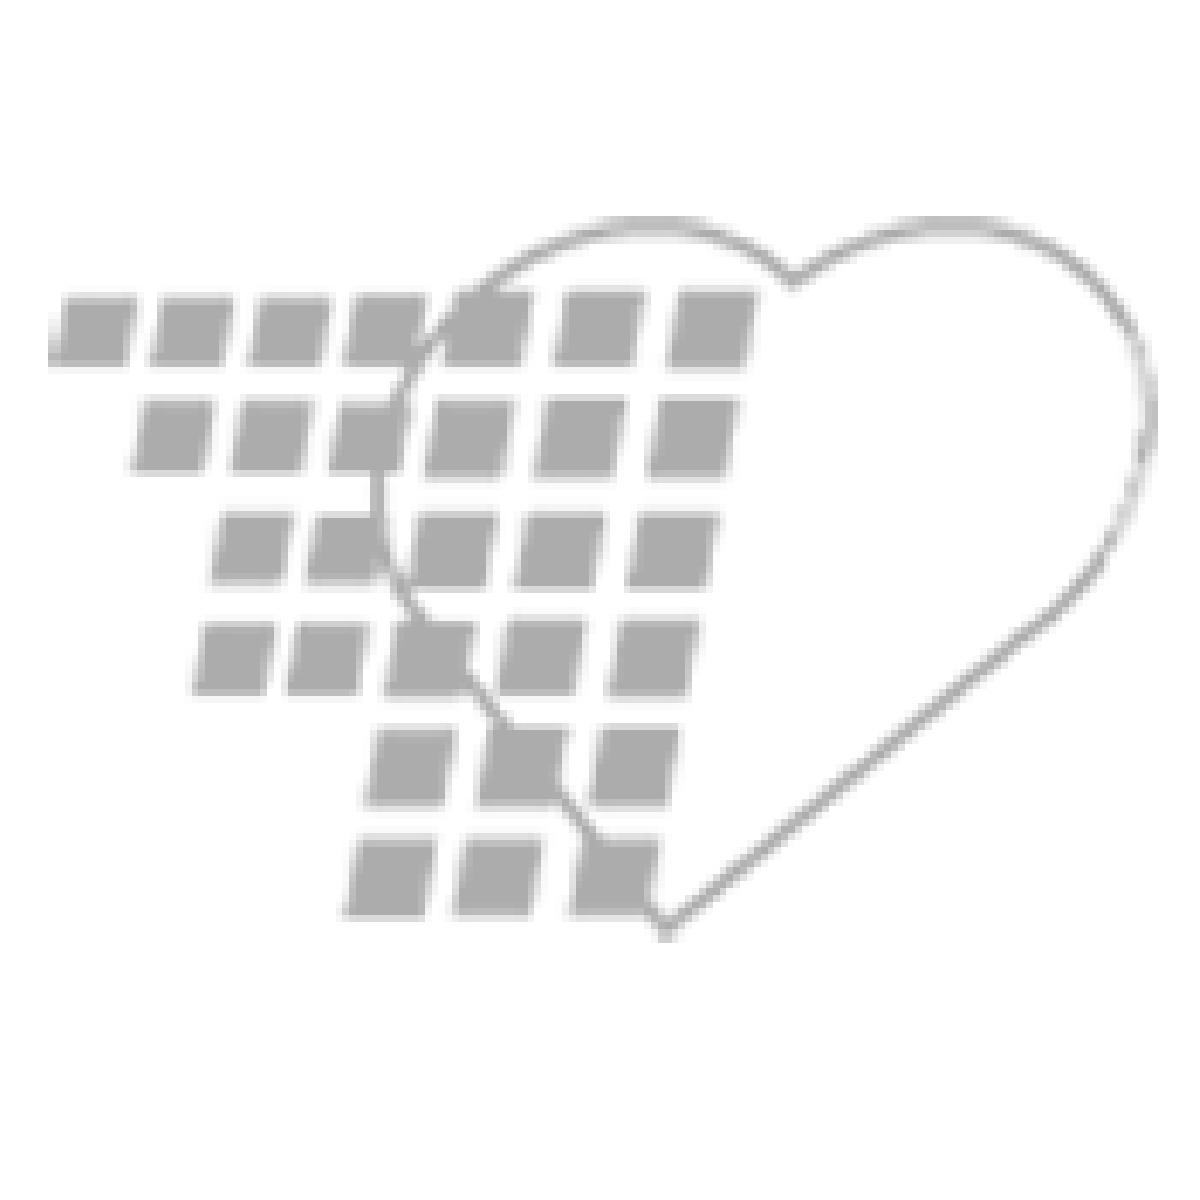 06-93-6102 Demo Dose® Simulated FFP B Rh Negative